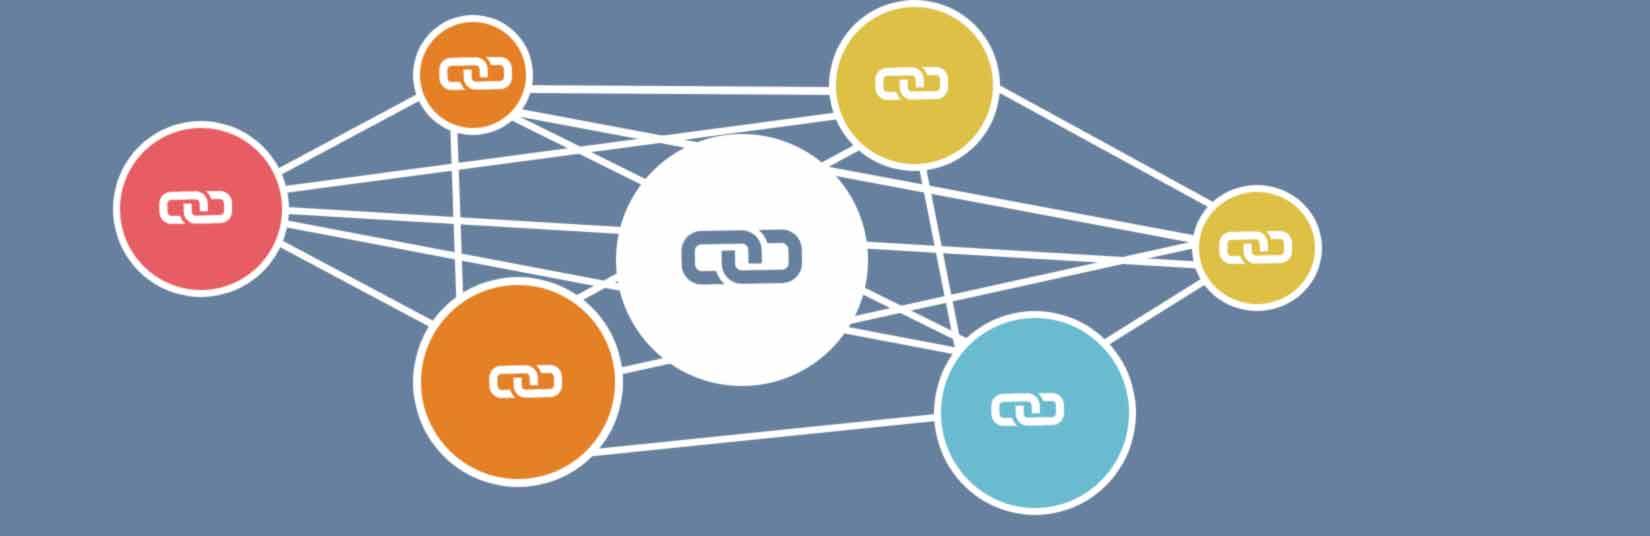 Internal linking, Seo